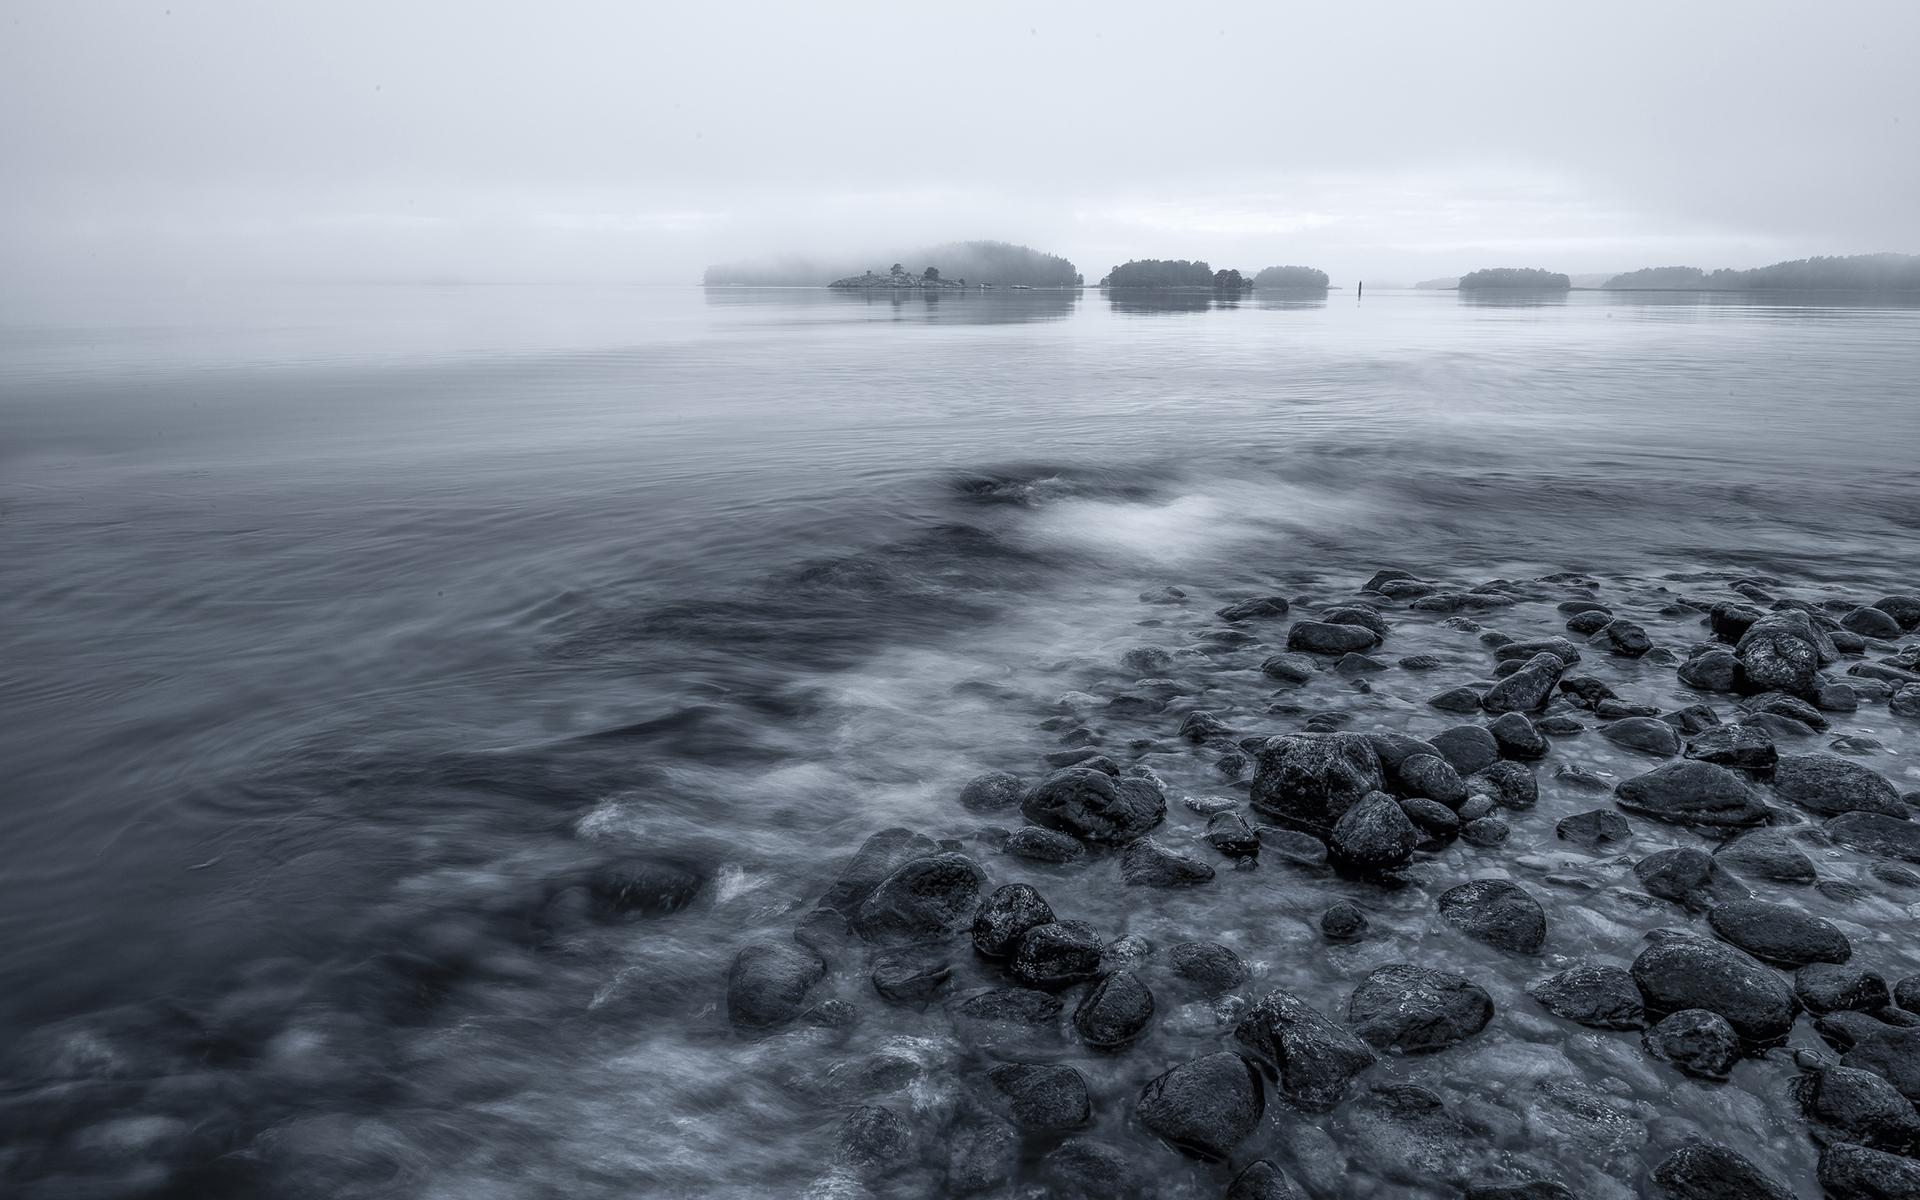 BW Rocks Stones Shore fog wallpaper | 1920x1200 | 133026 | WallpaperUP